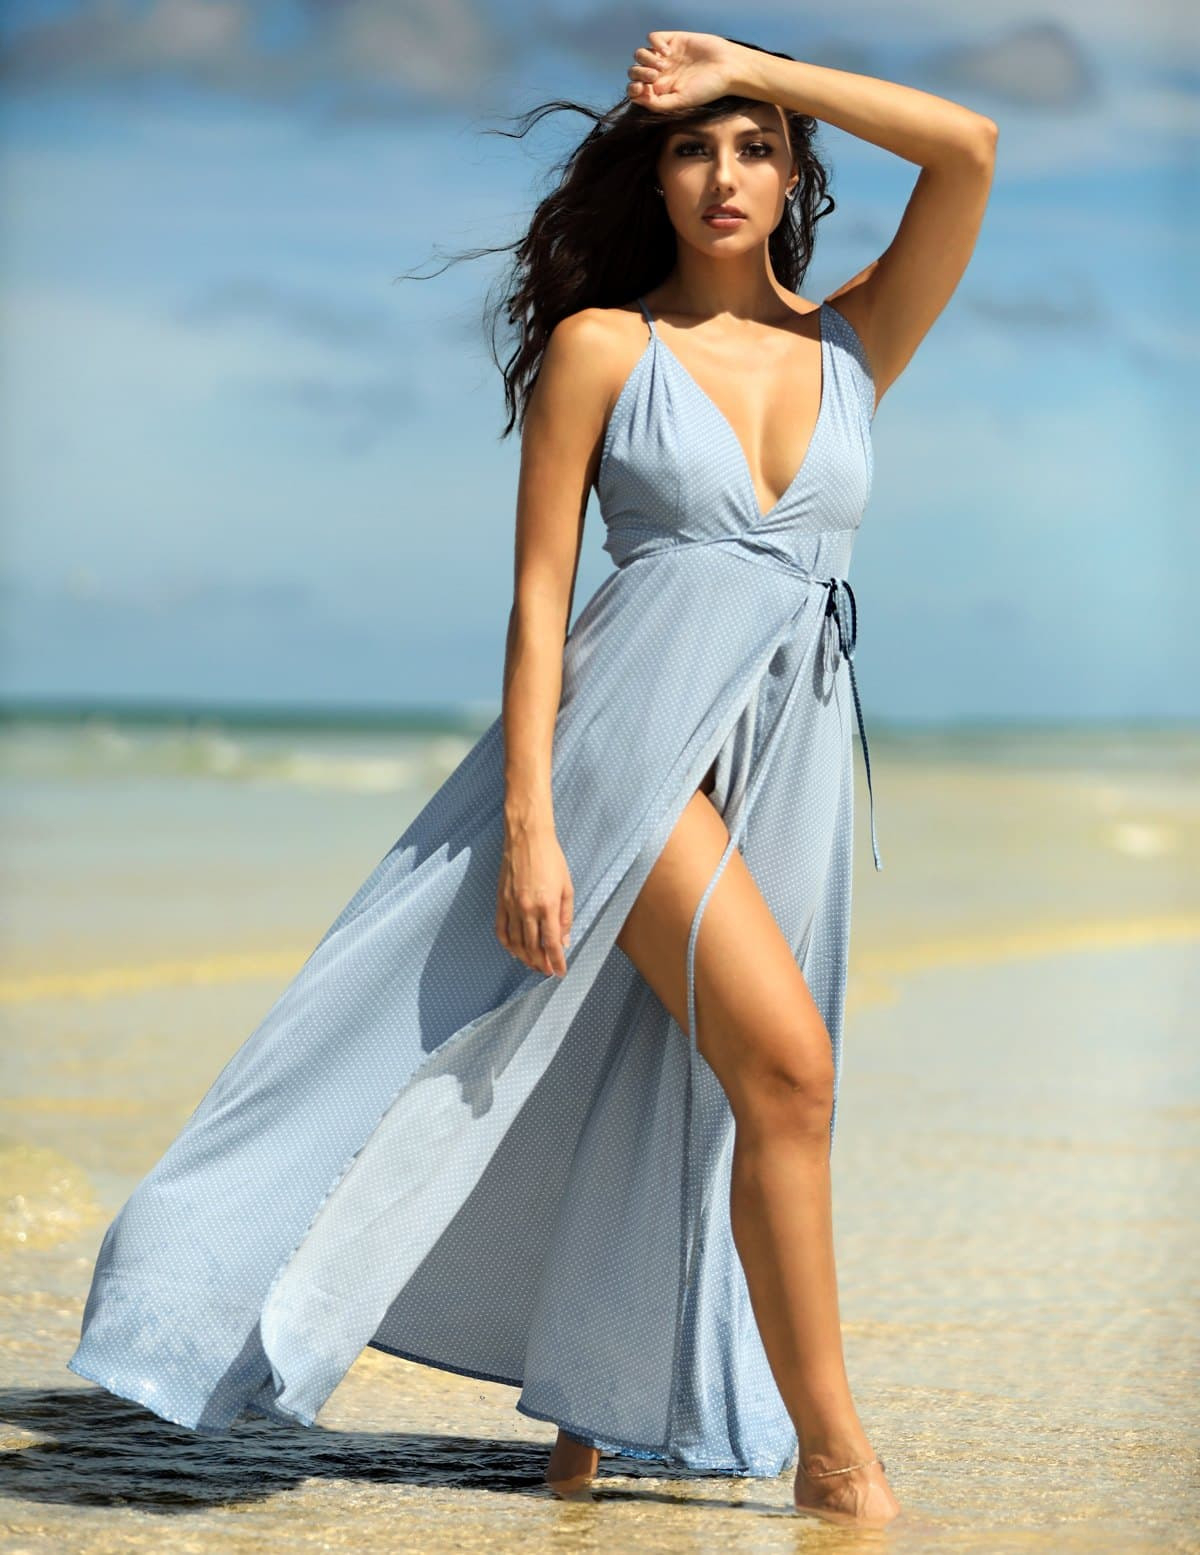 20 Genial Sommer Abendkleider Stylish13 Top Sommer Abendkleider Galerie